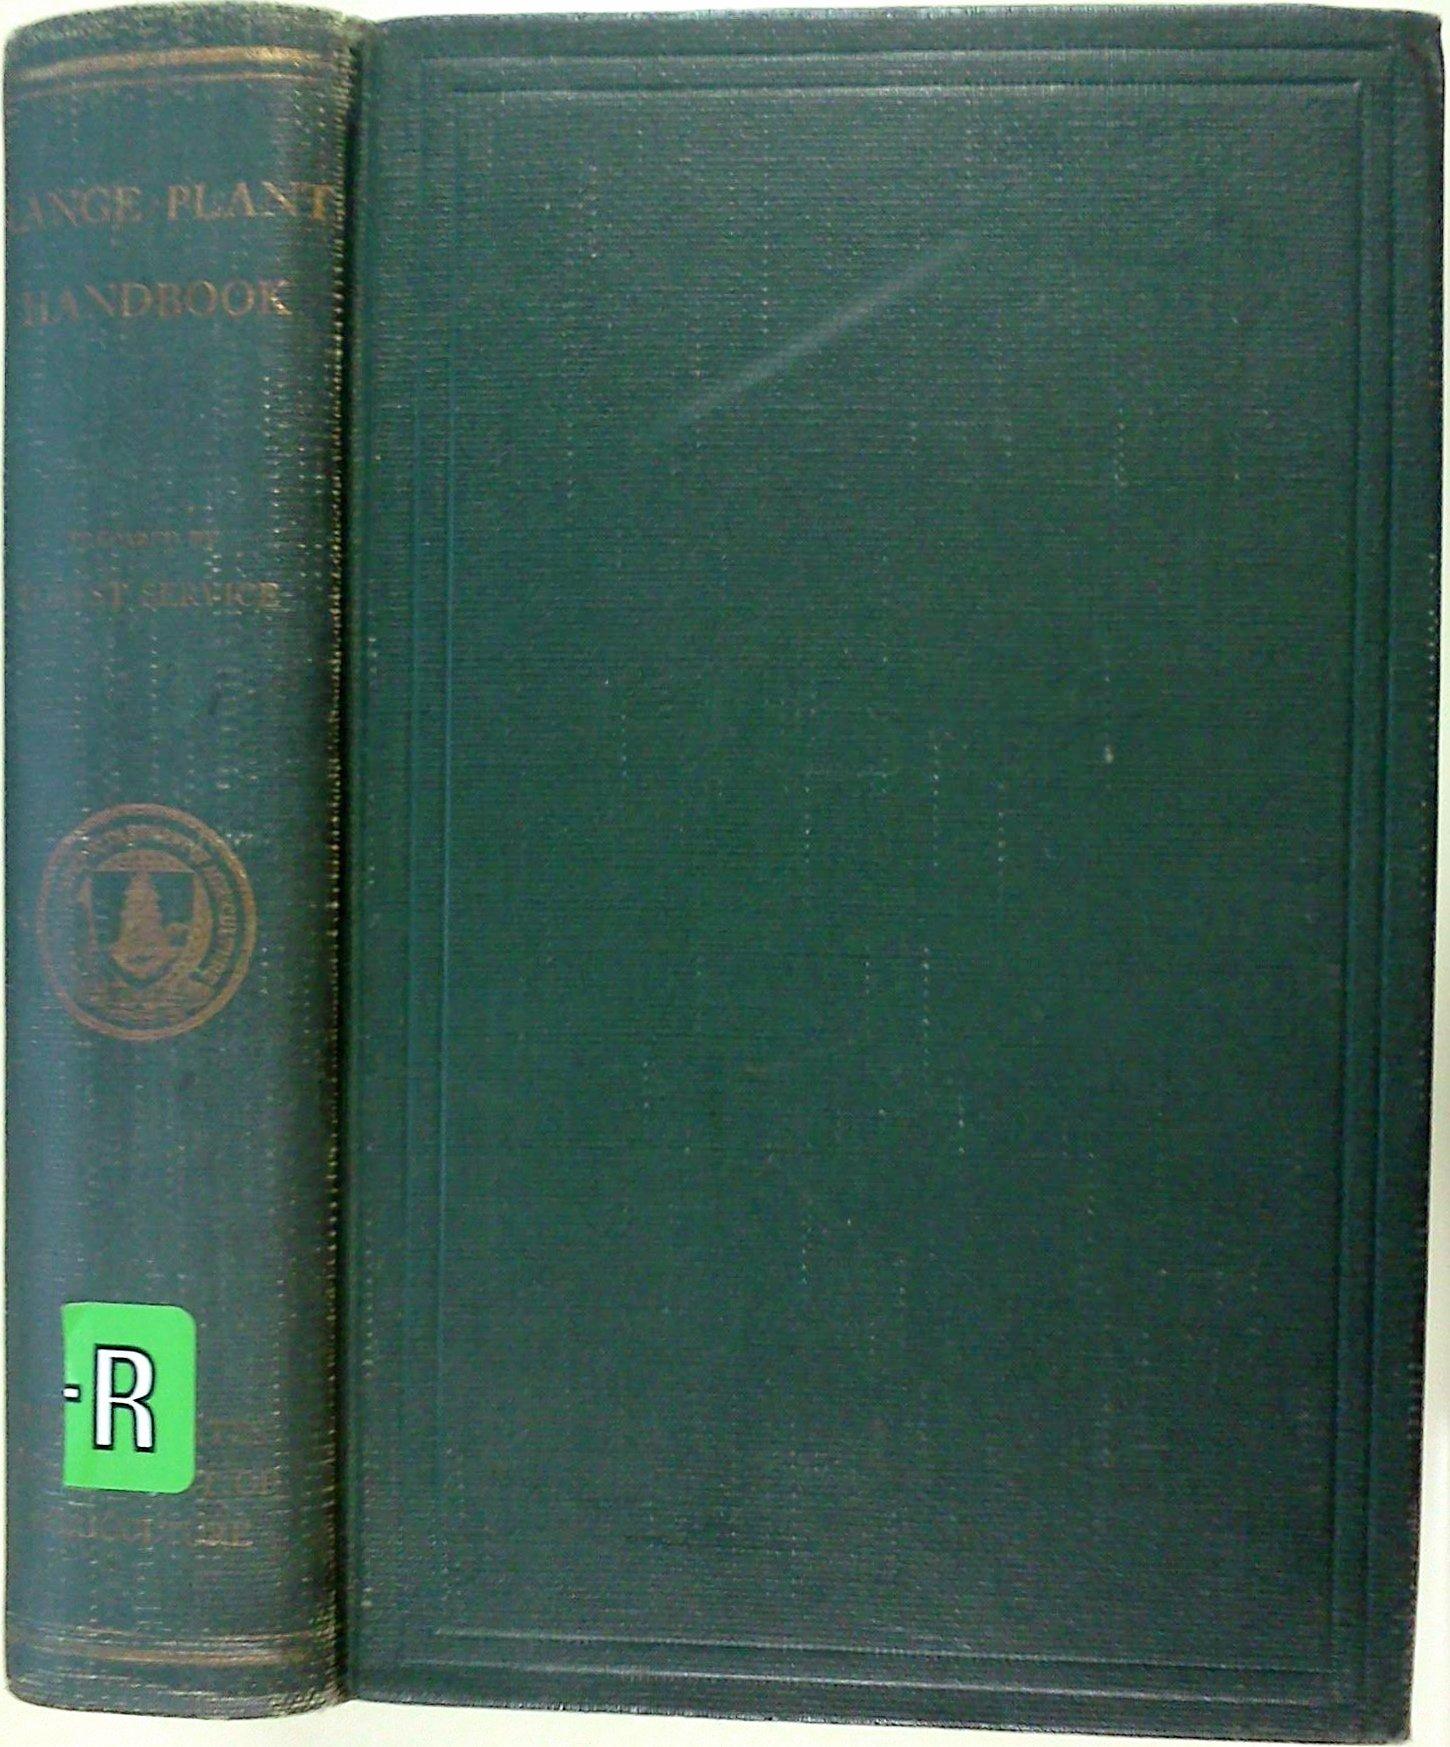 Range Plant Handbook